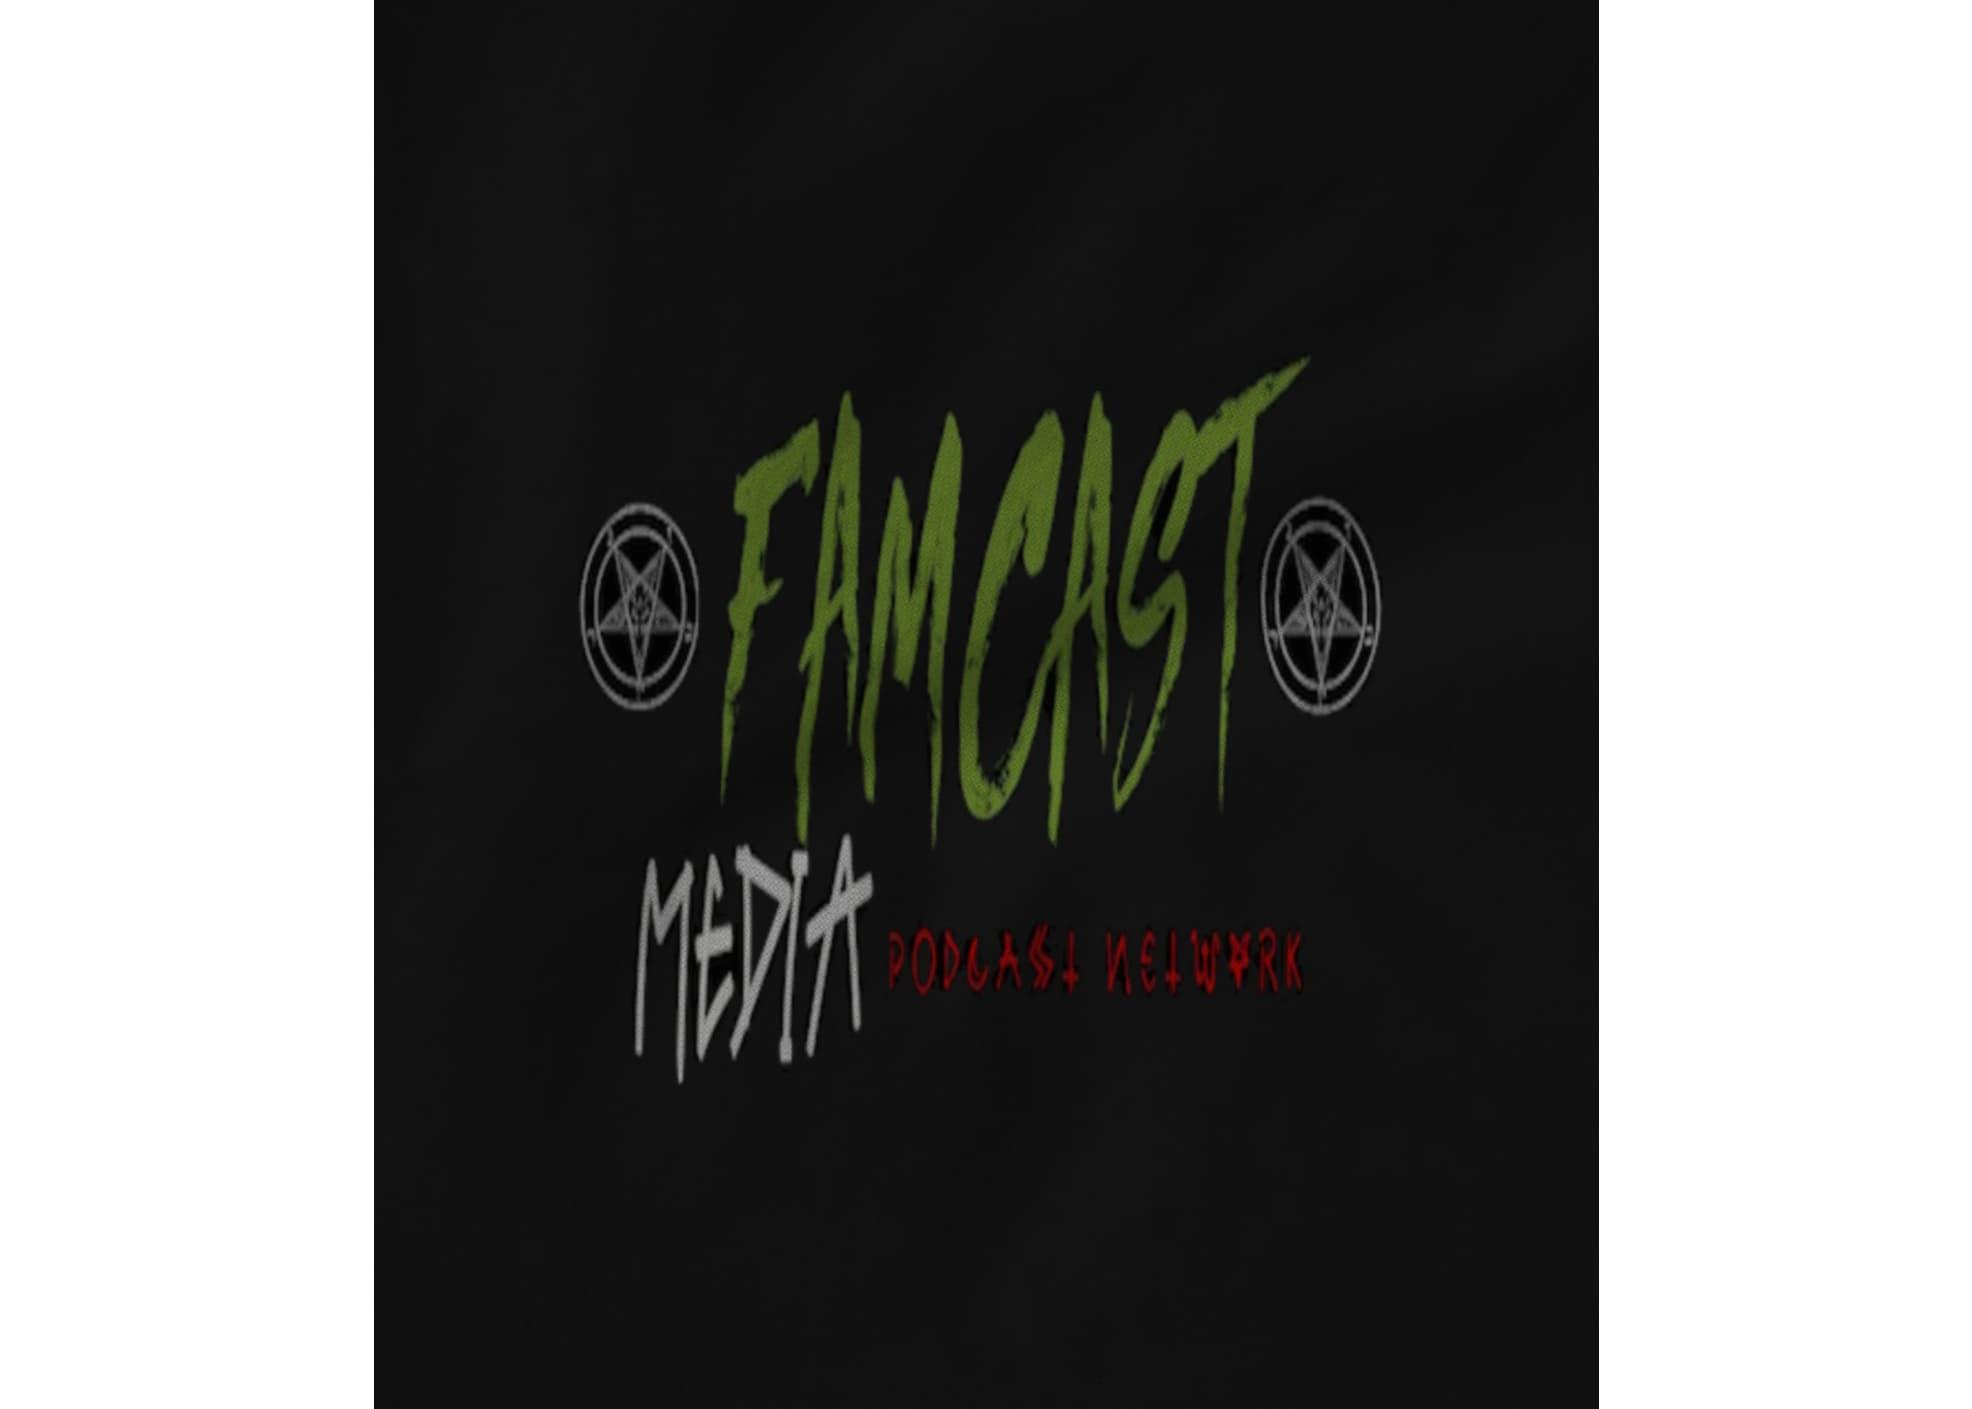 Famcast media logo 1603824158